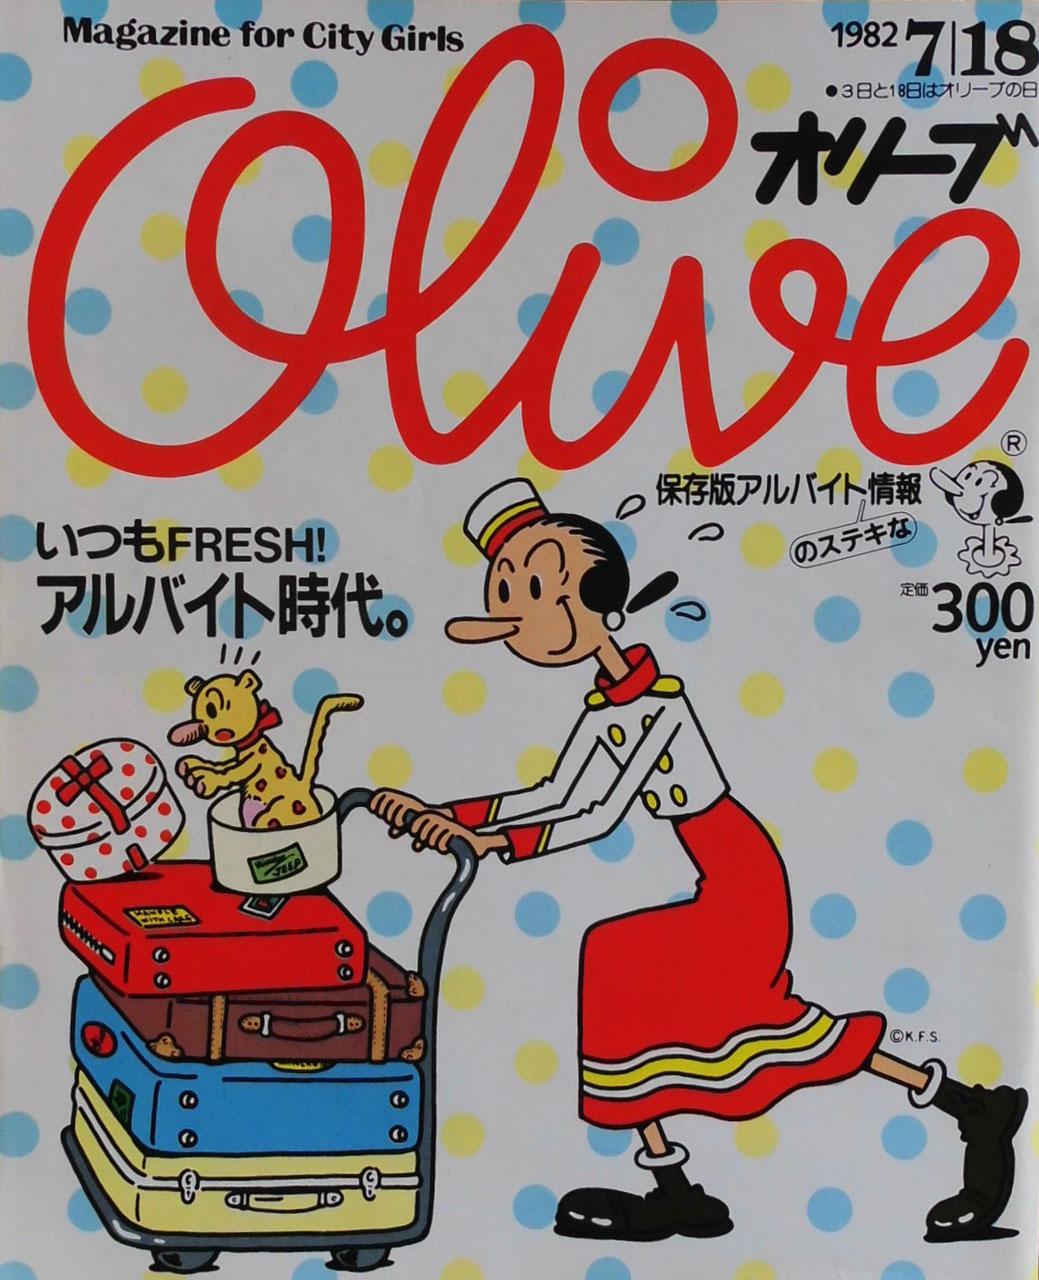 7788610fe43dd Olive 4 オリーブ Mgazine for City Girls 1982 7 18 いつもFresh!アルバイト